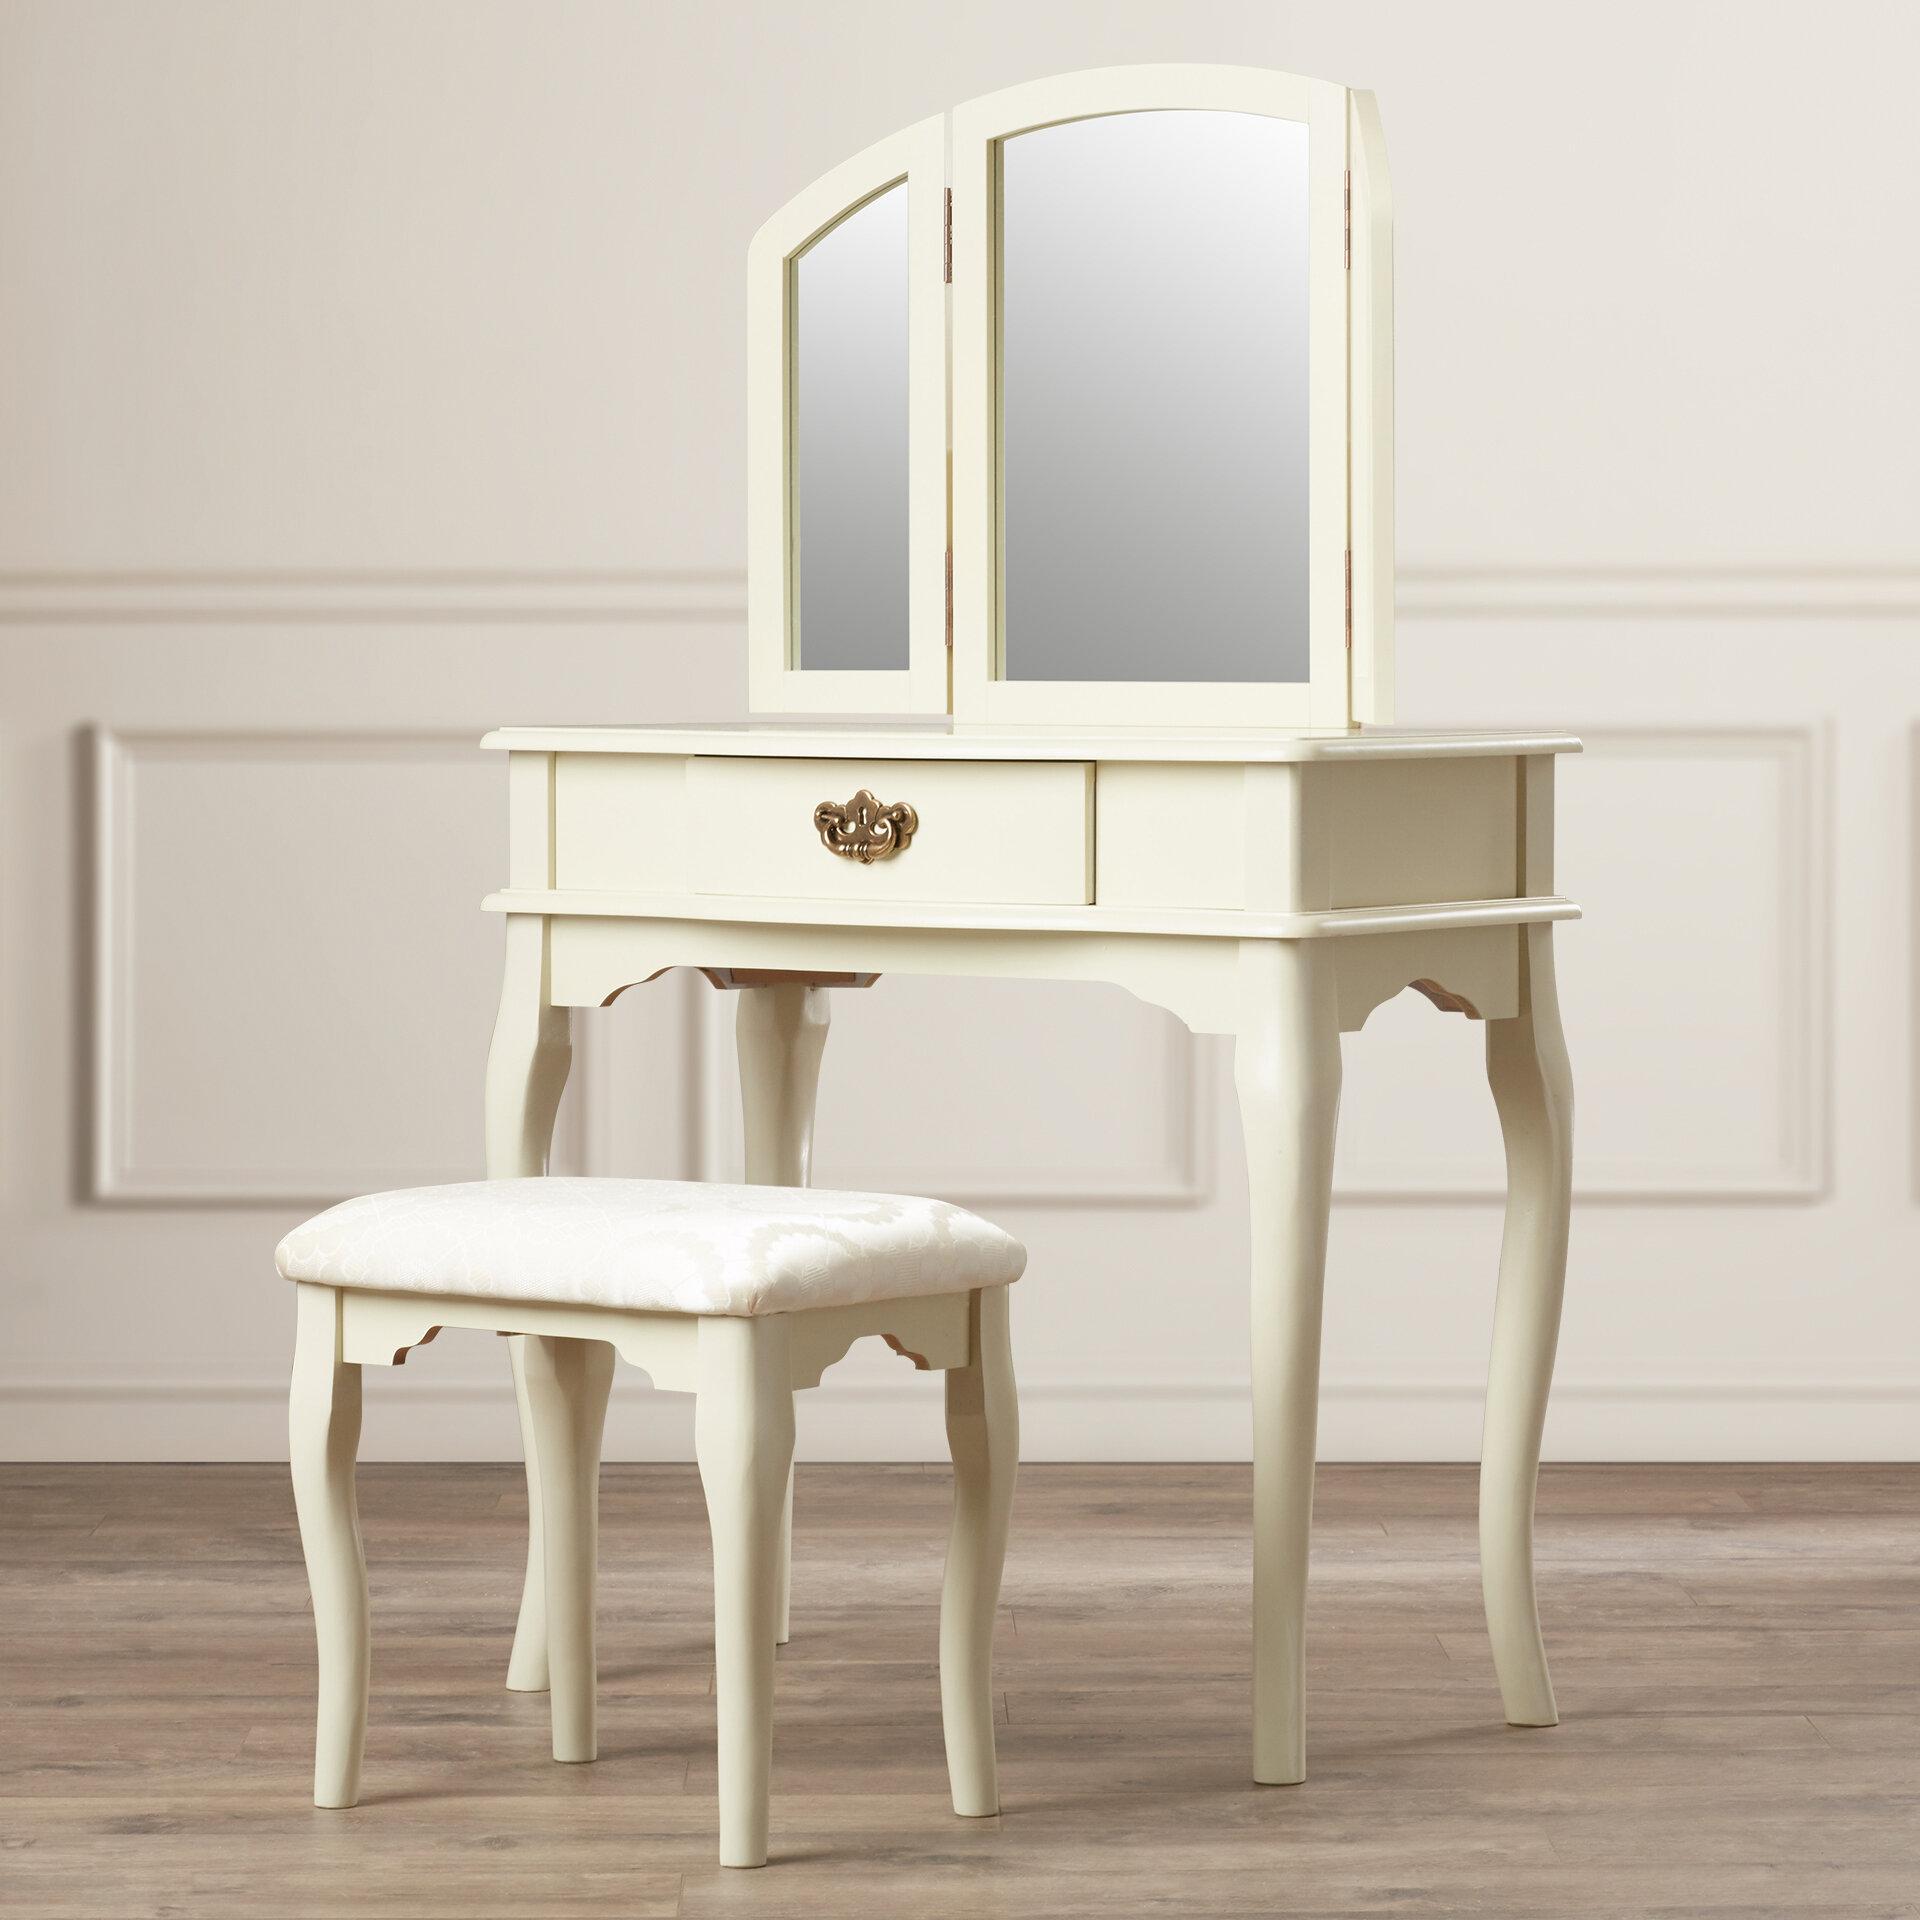 tri fold mirror vanity set. Charlton Home Livingston 3 Piece Vanity Set with Trifold Mirror  Reviews Wayfair